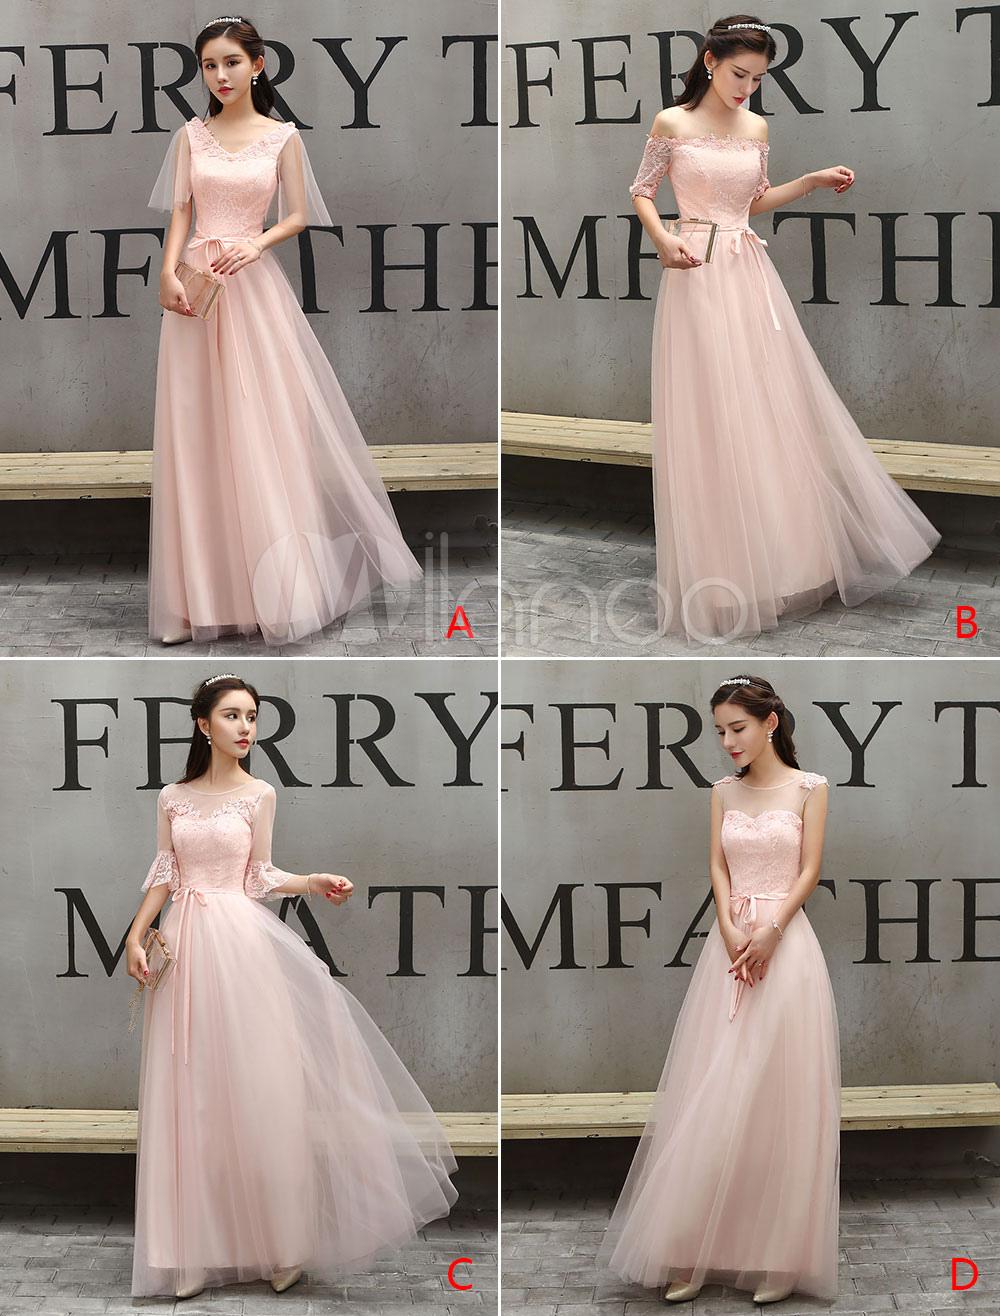 Peach Bridesmaid Dresses Long Prom Dress Tulle Floor Length Occasion Dress